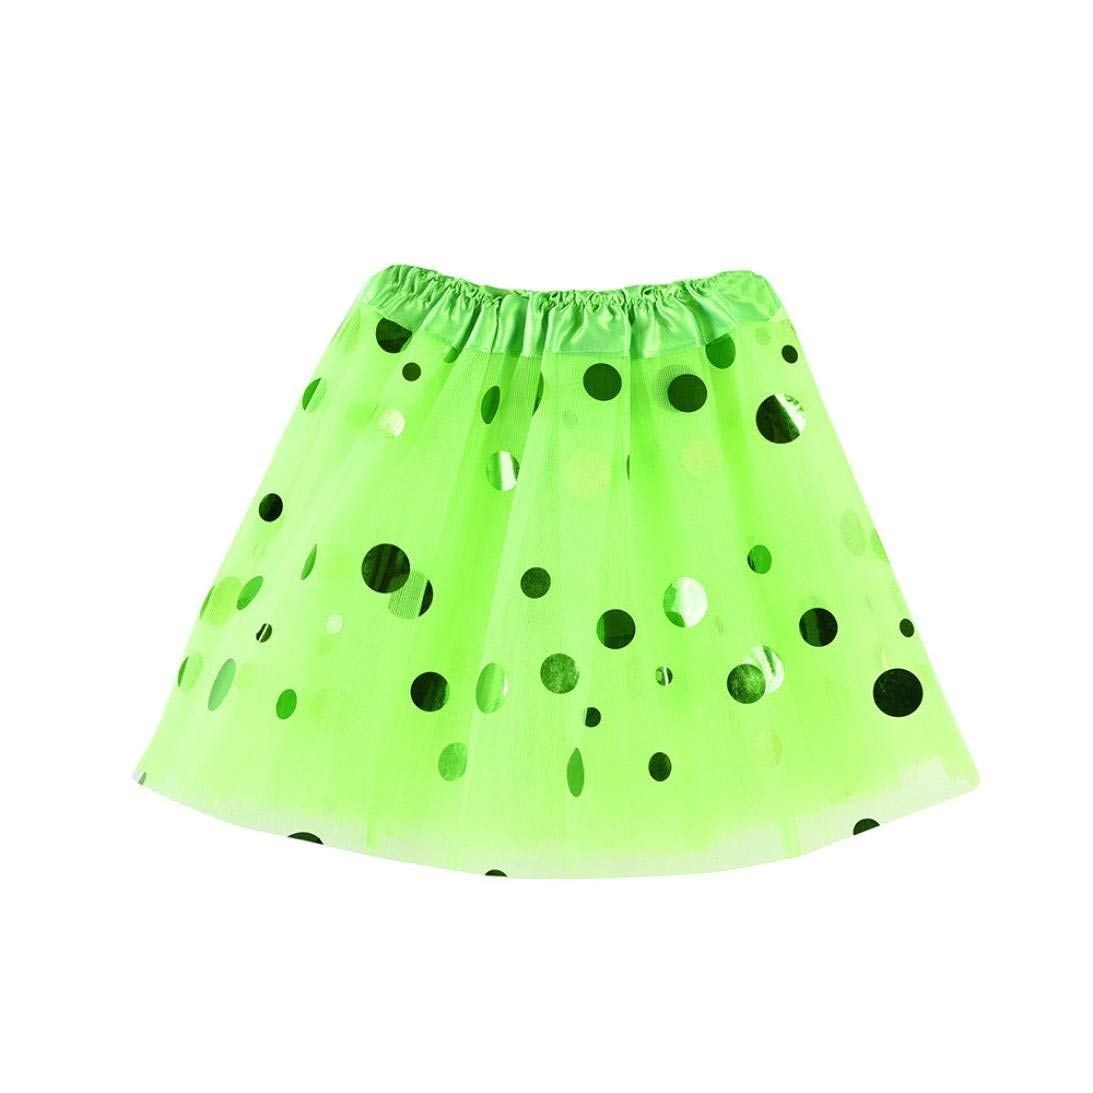 ec4abbba7 Get Quotations · Inkach Baby Tutu Skirt - Toddler Girls Polka Dot Printed Ballet  Skirts Dance Fluffy Tulle Petticoat